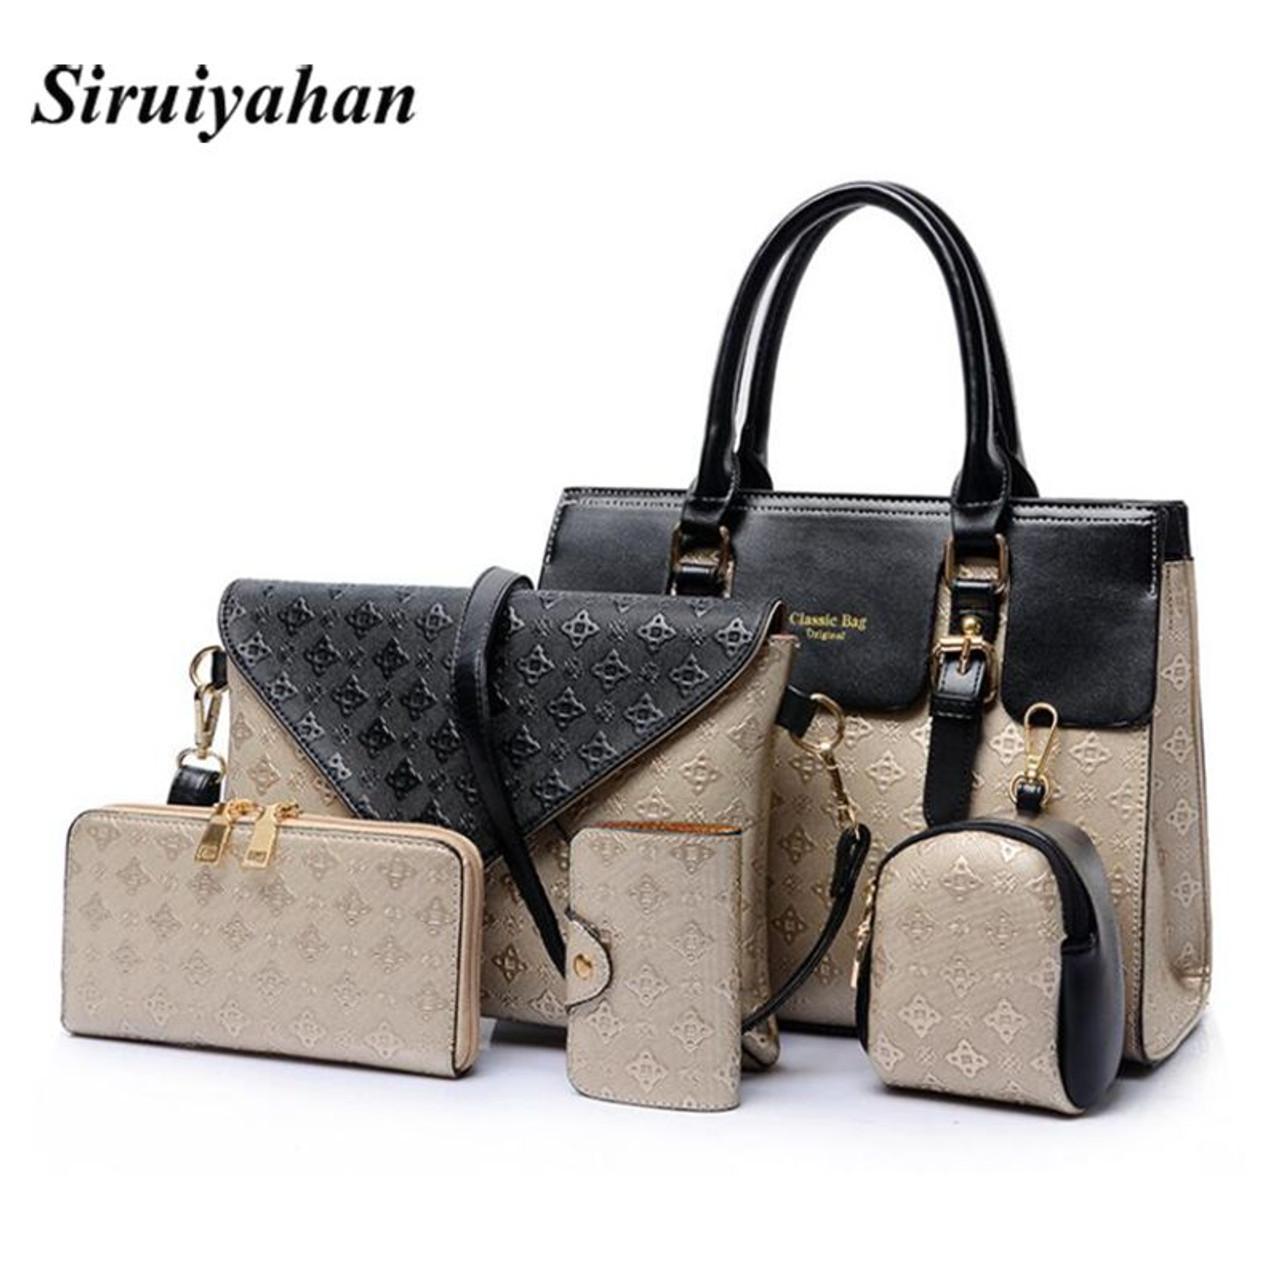 21cc7a55252 ... 5Piece/Set 2018 New Women Bags Leather Handbags Fashion Shoulder Bag  Female Purse Ladies Crossbody ...